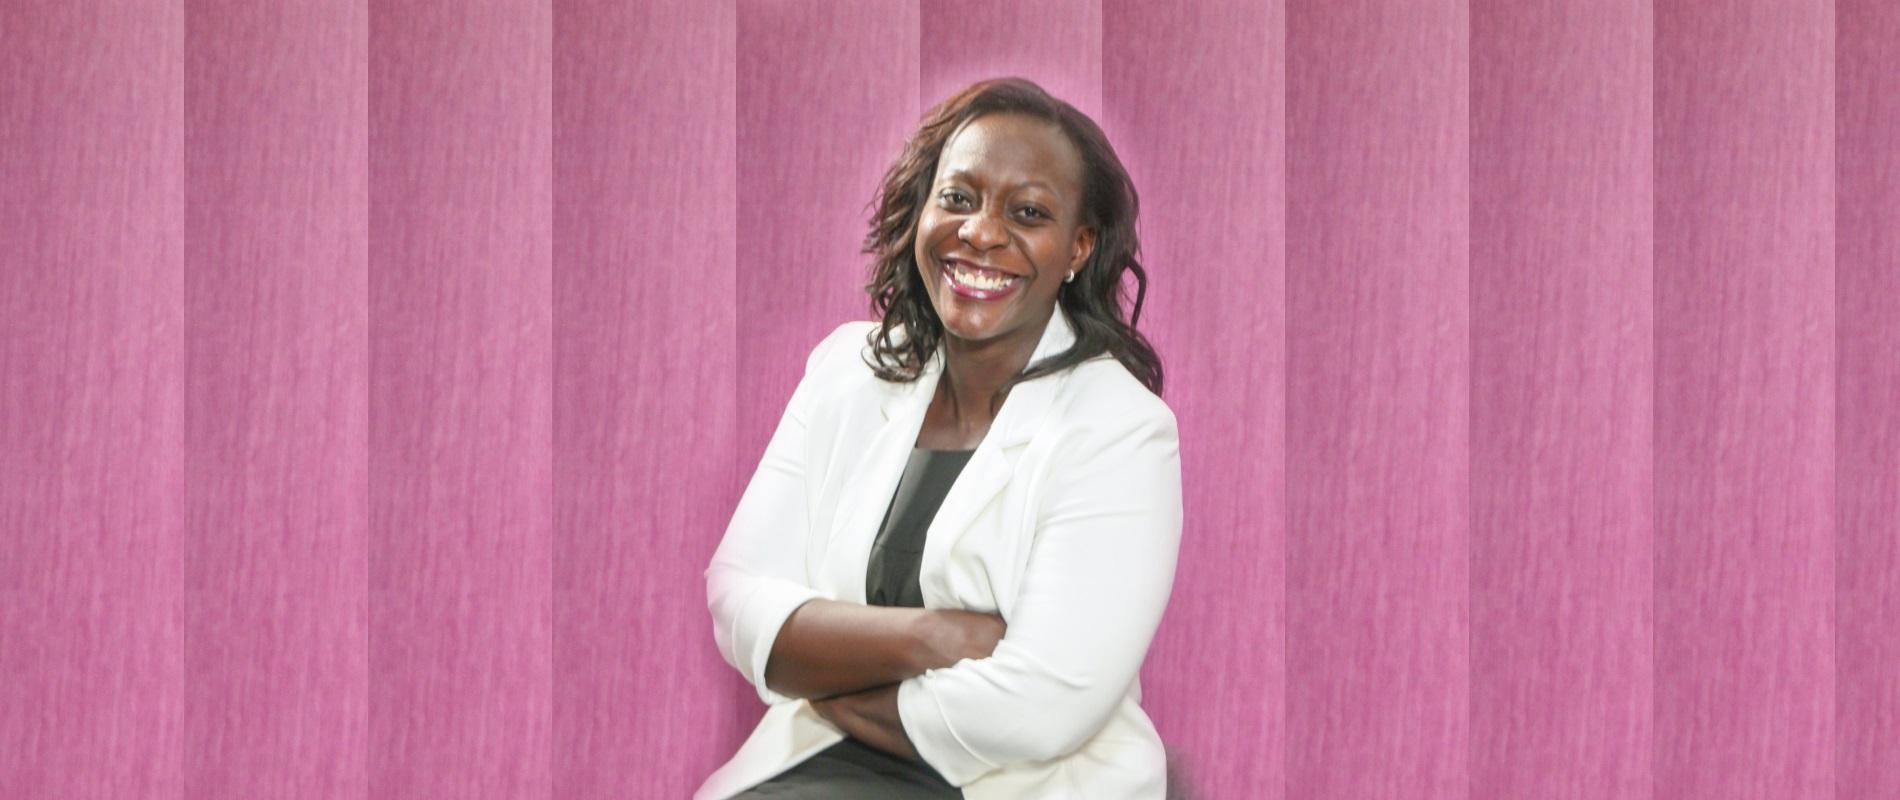 Dr Wanjiru Ndegwa